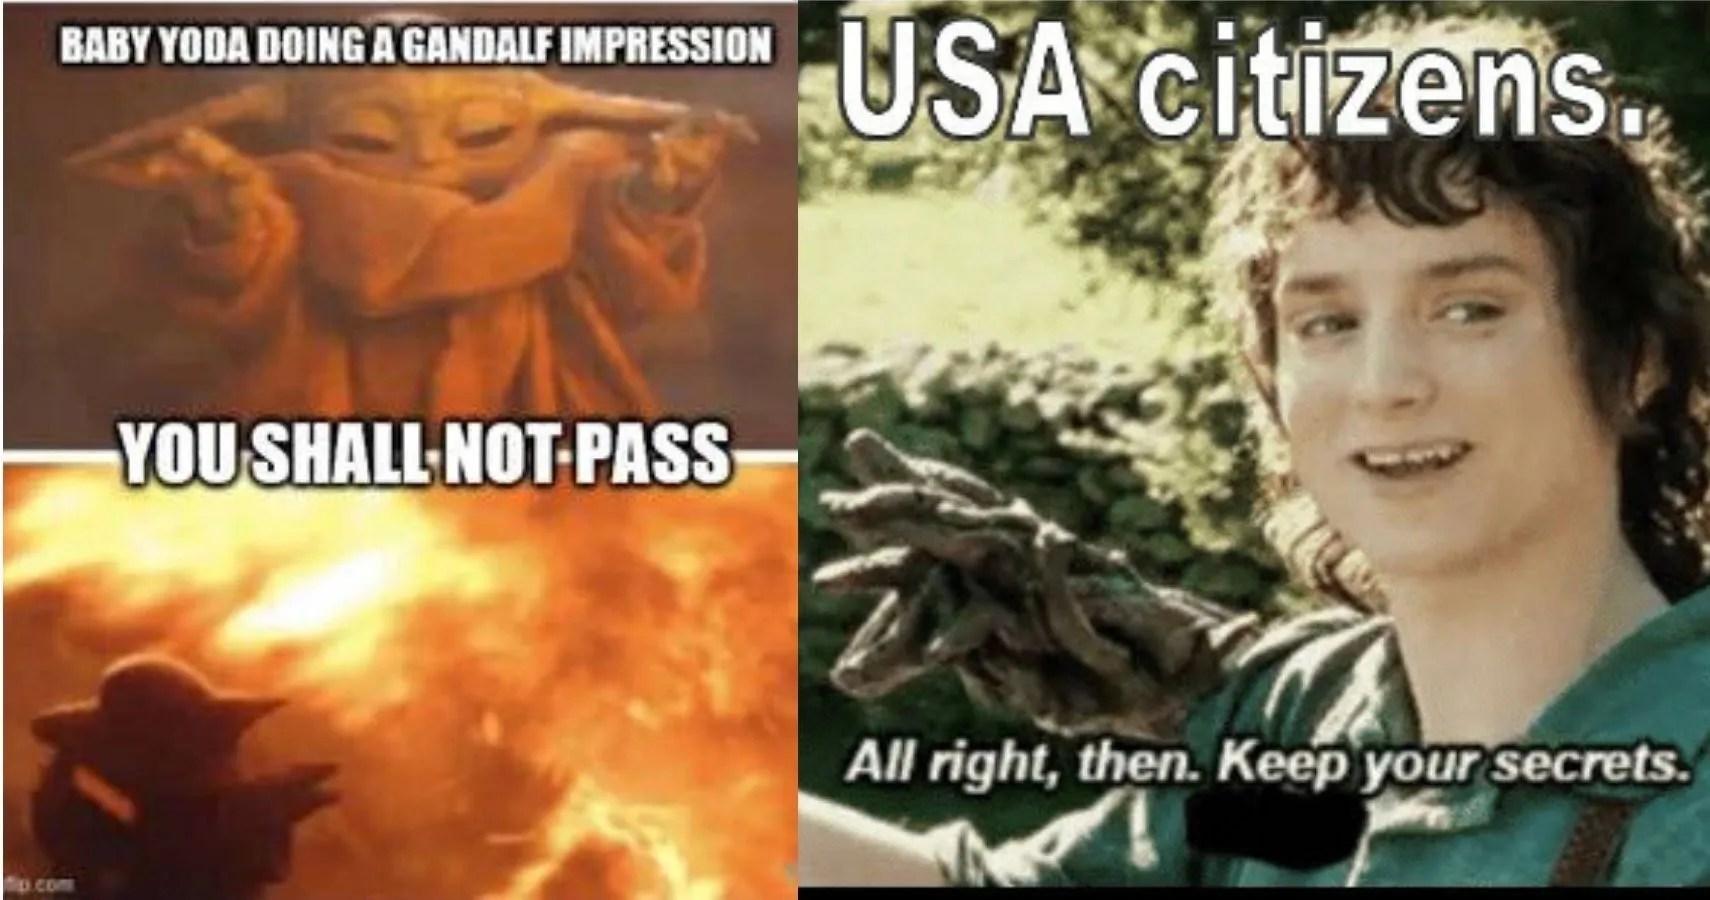 You Shall Not Pass Multipass Bitch Gandalf Fifth Element